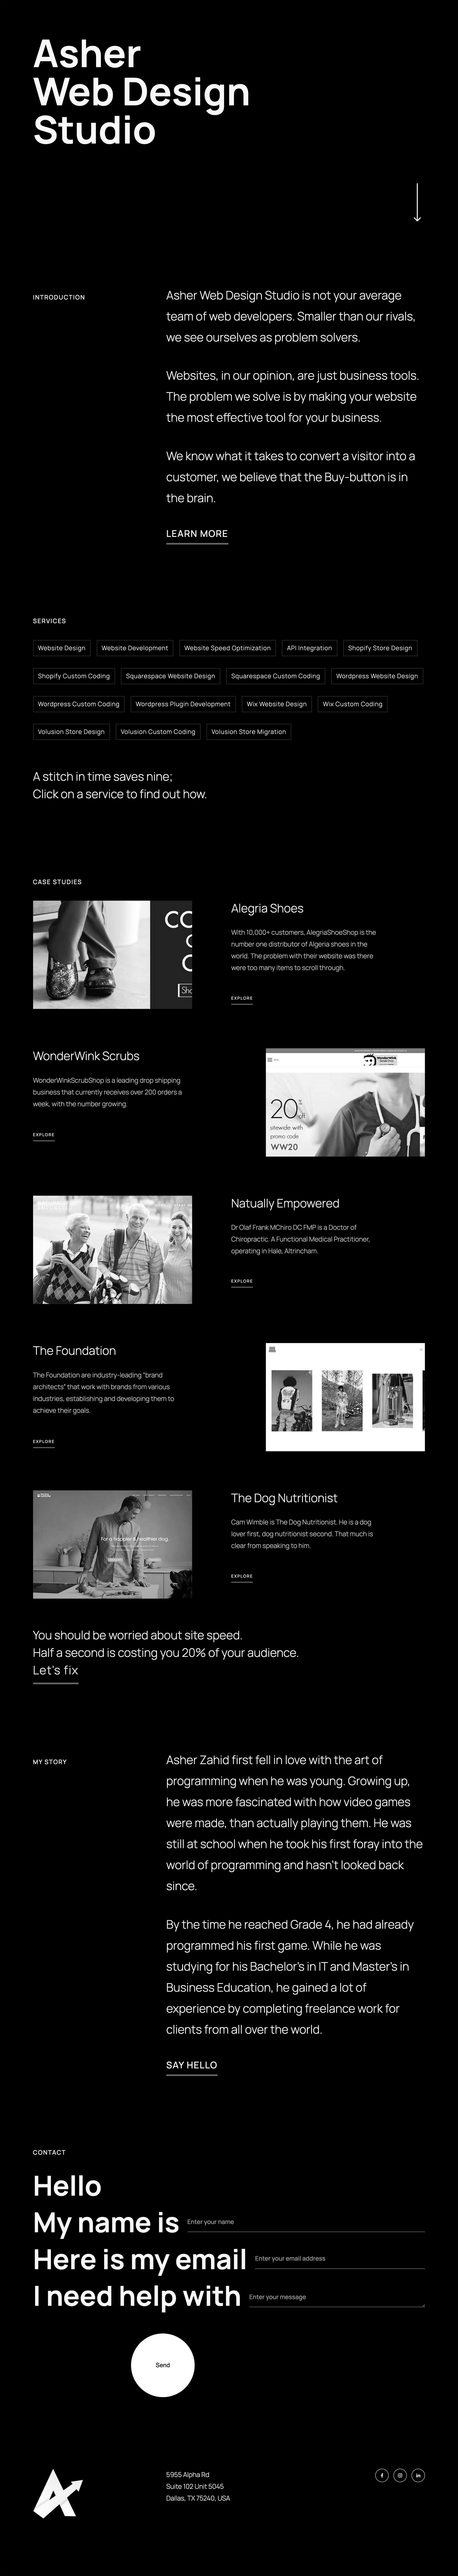 Asher Web Design Studio Website Screenshot